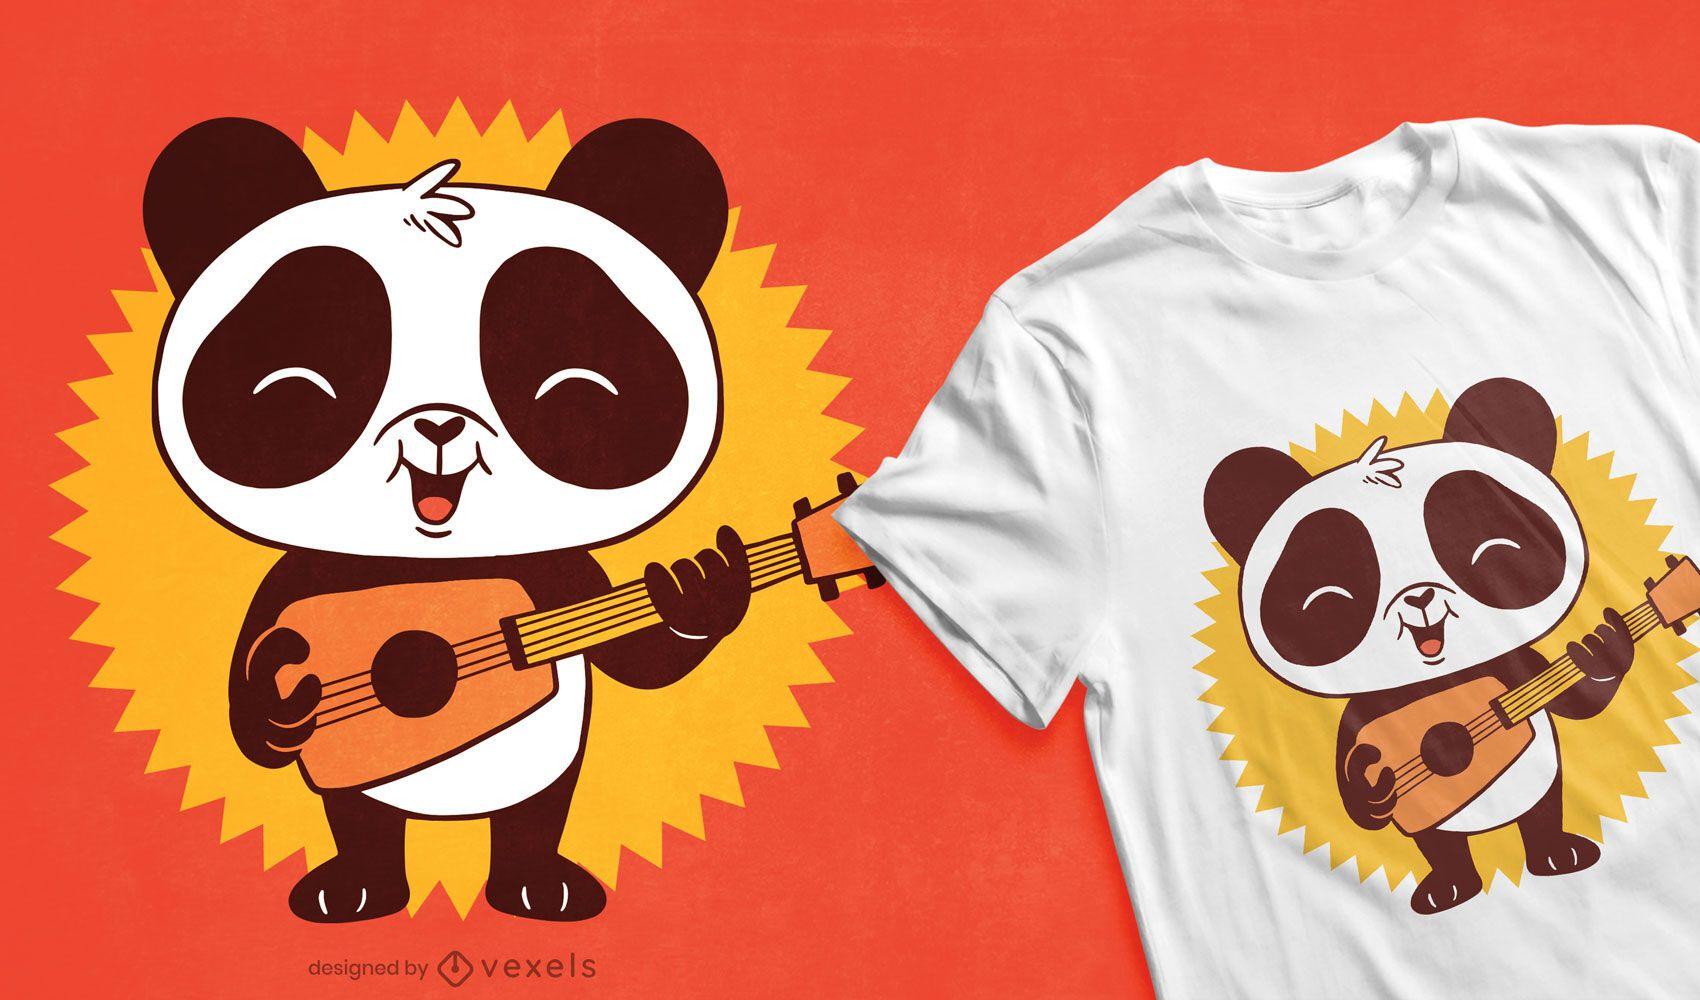 Baby panda t-shirt design